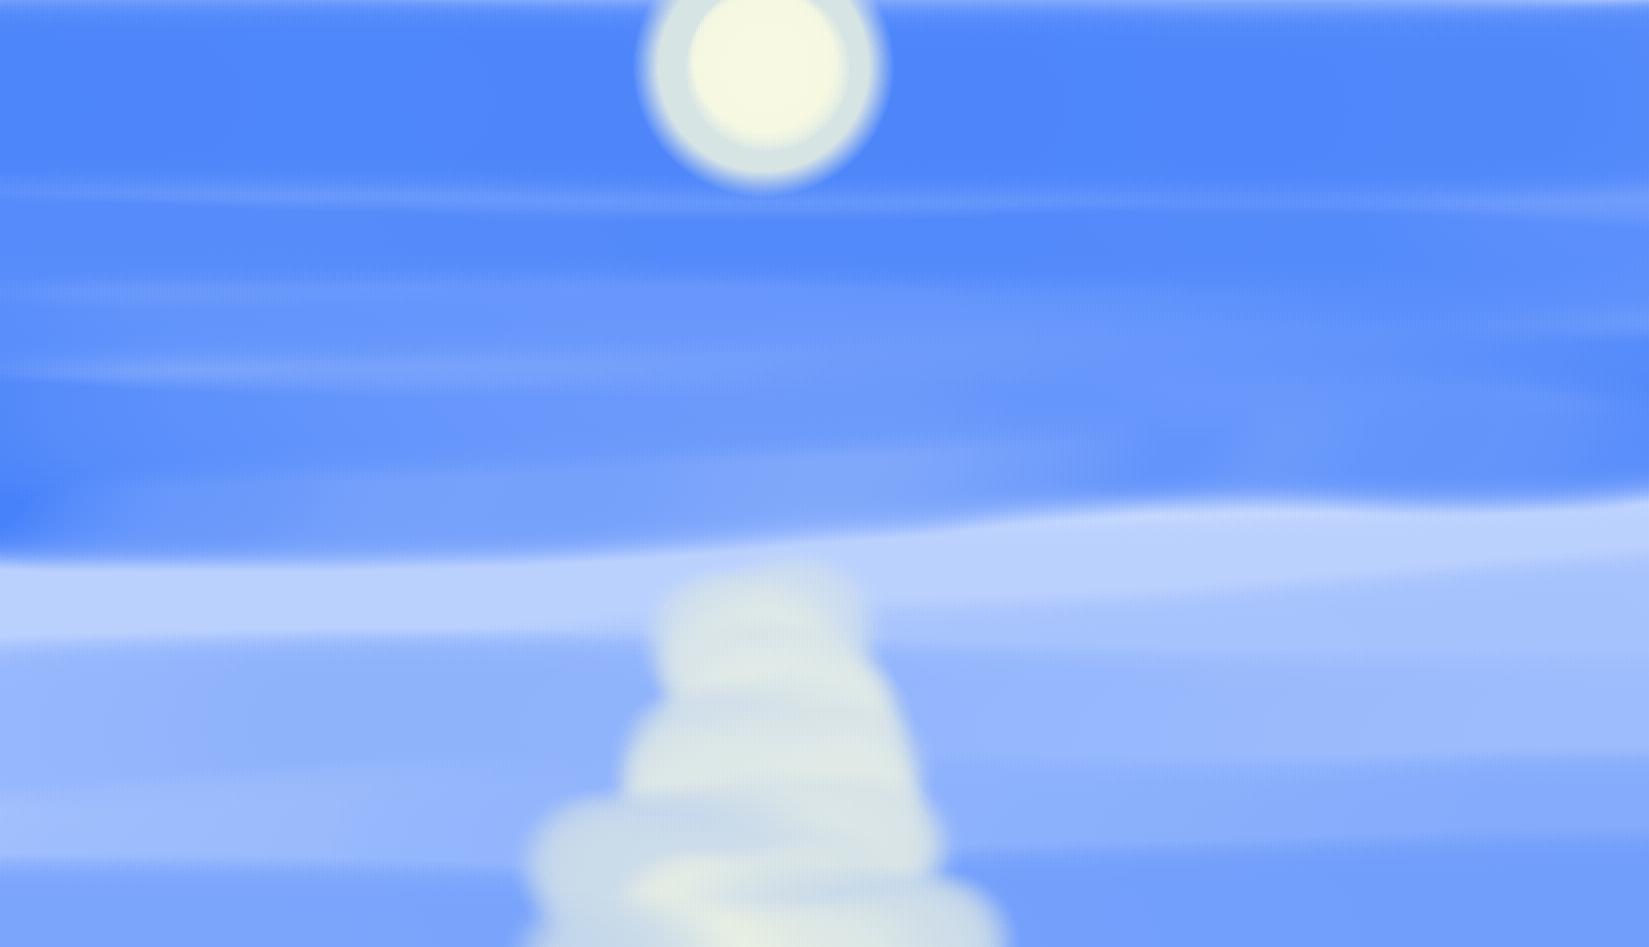 kleki pleine lune byothe